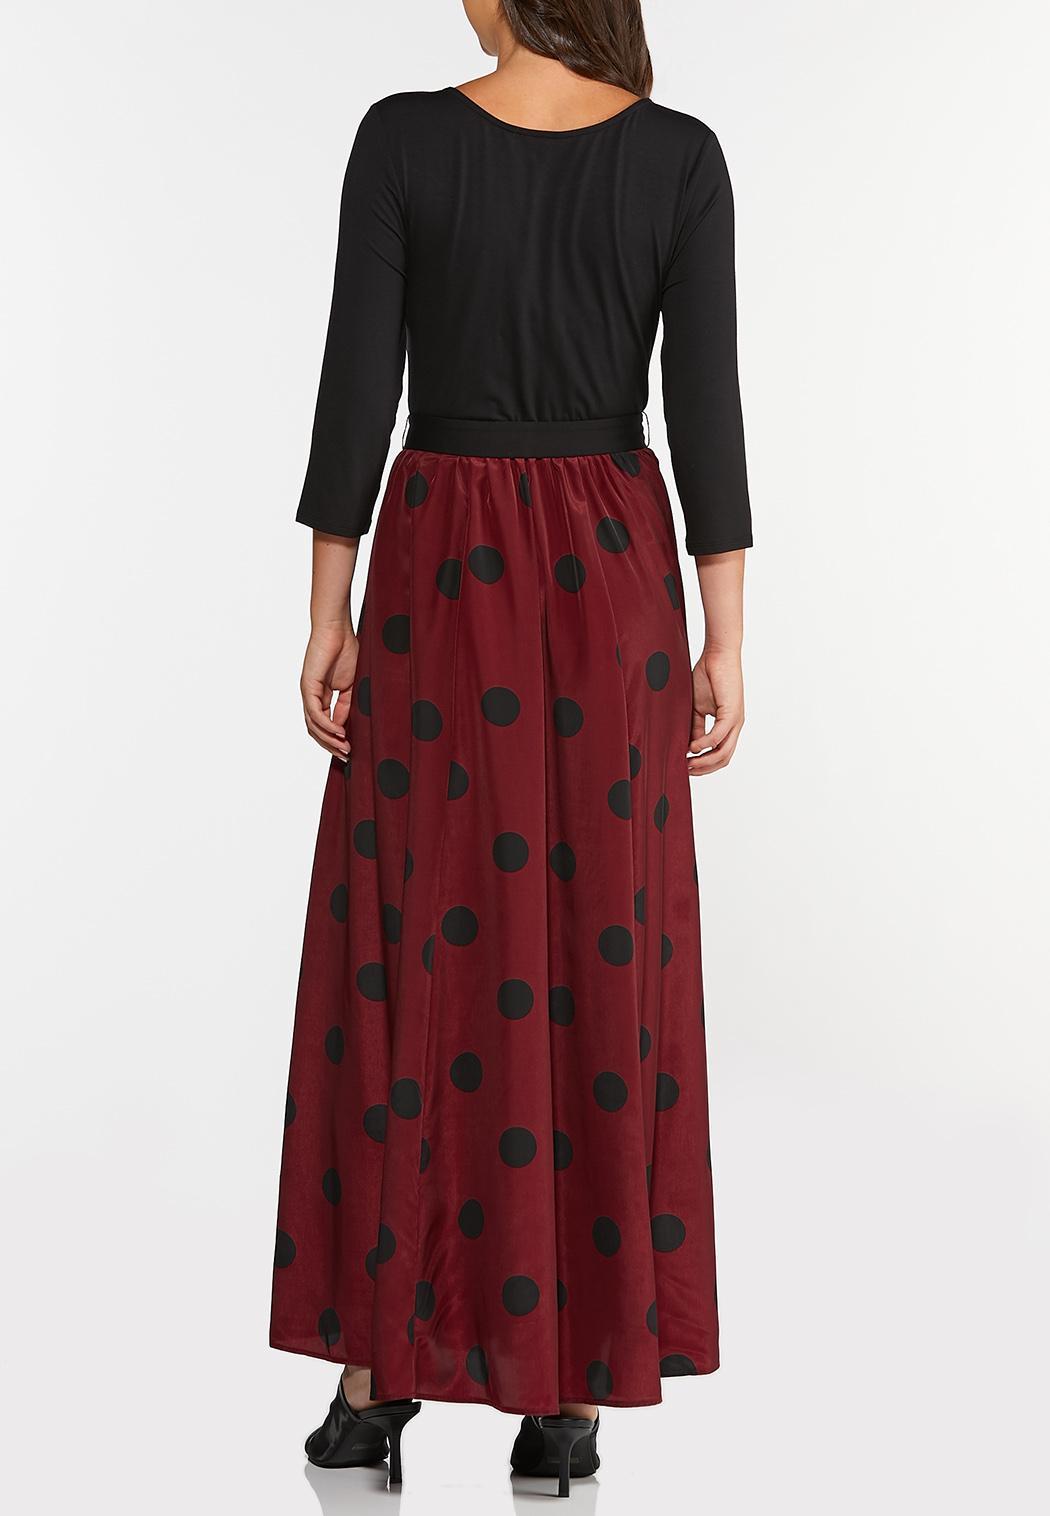 Plus Size Polka Dot Colorblock Dress (Item #44357495)